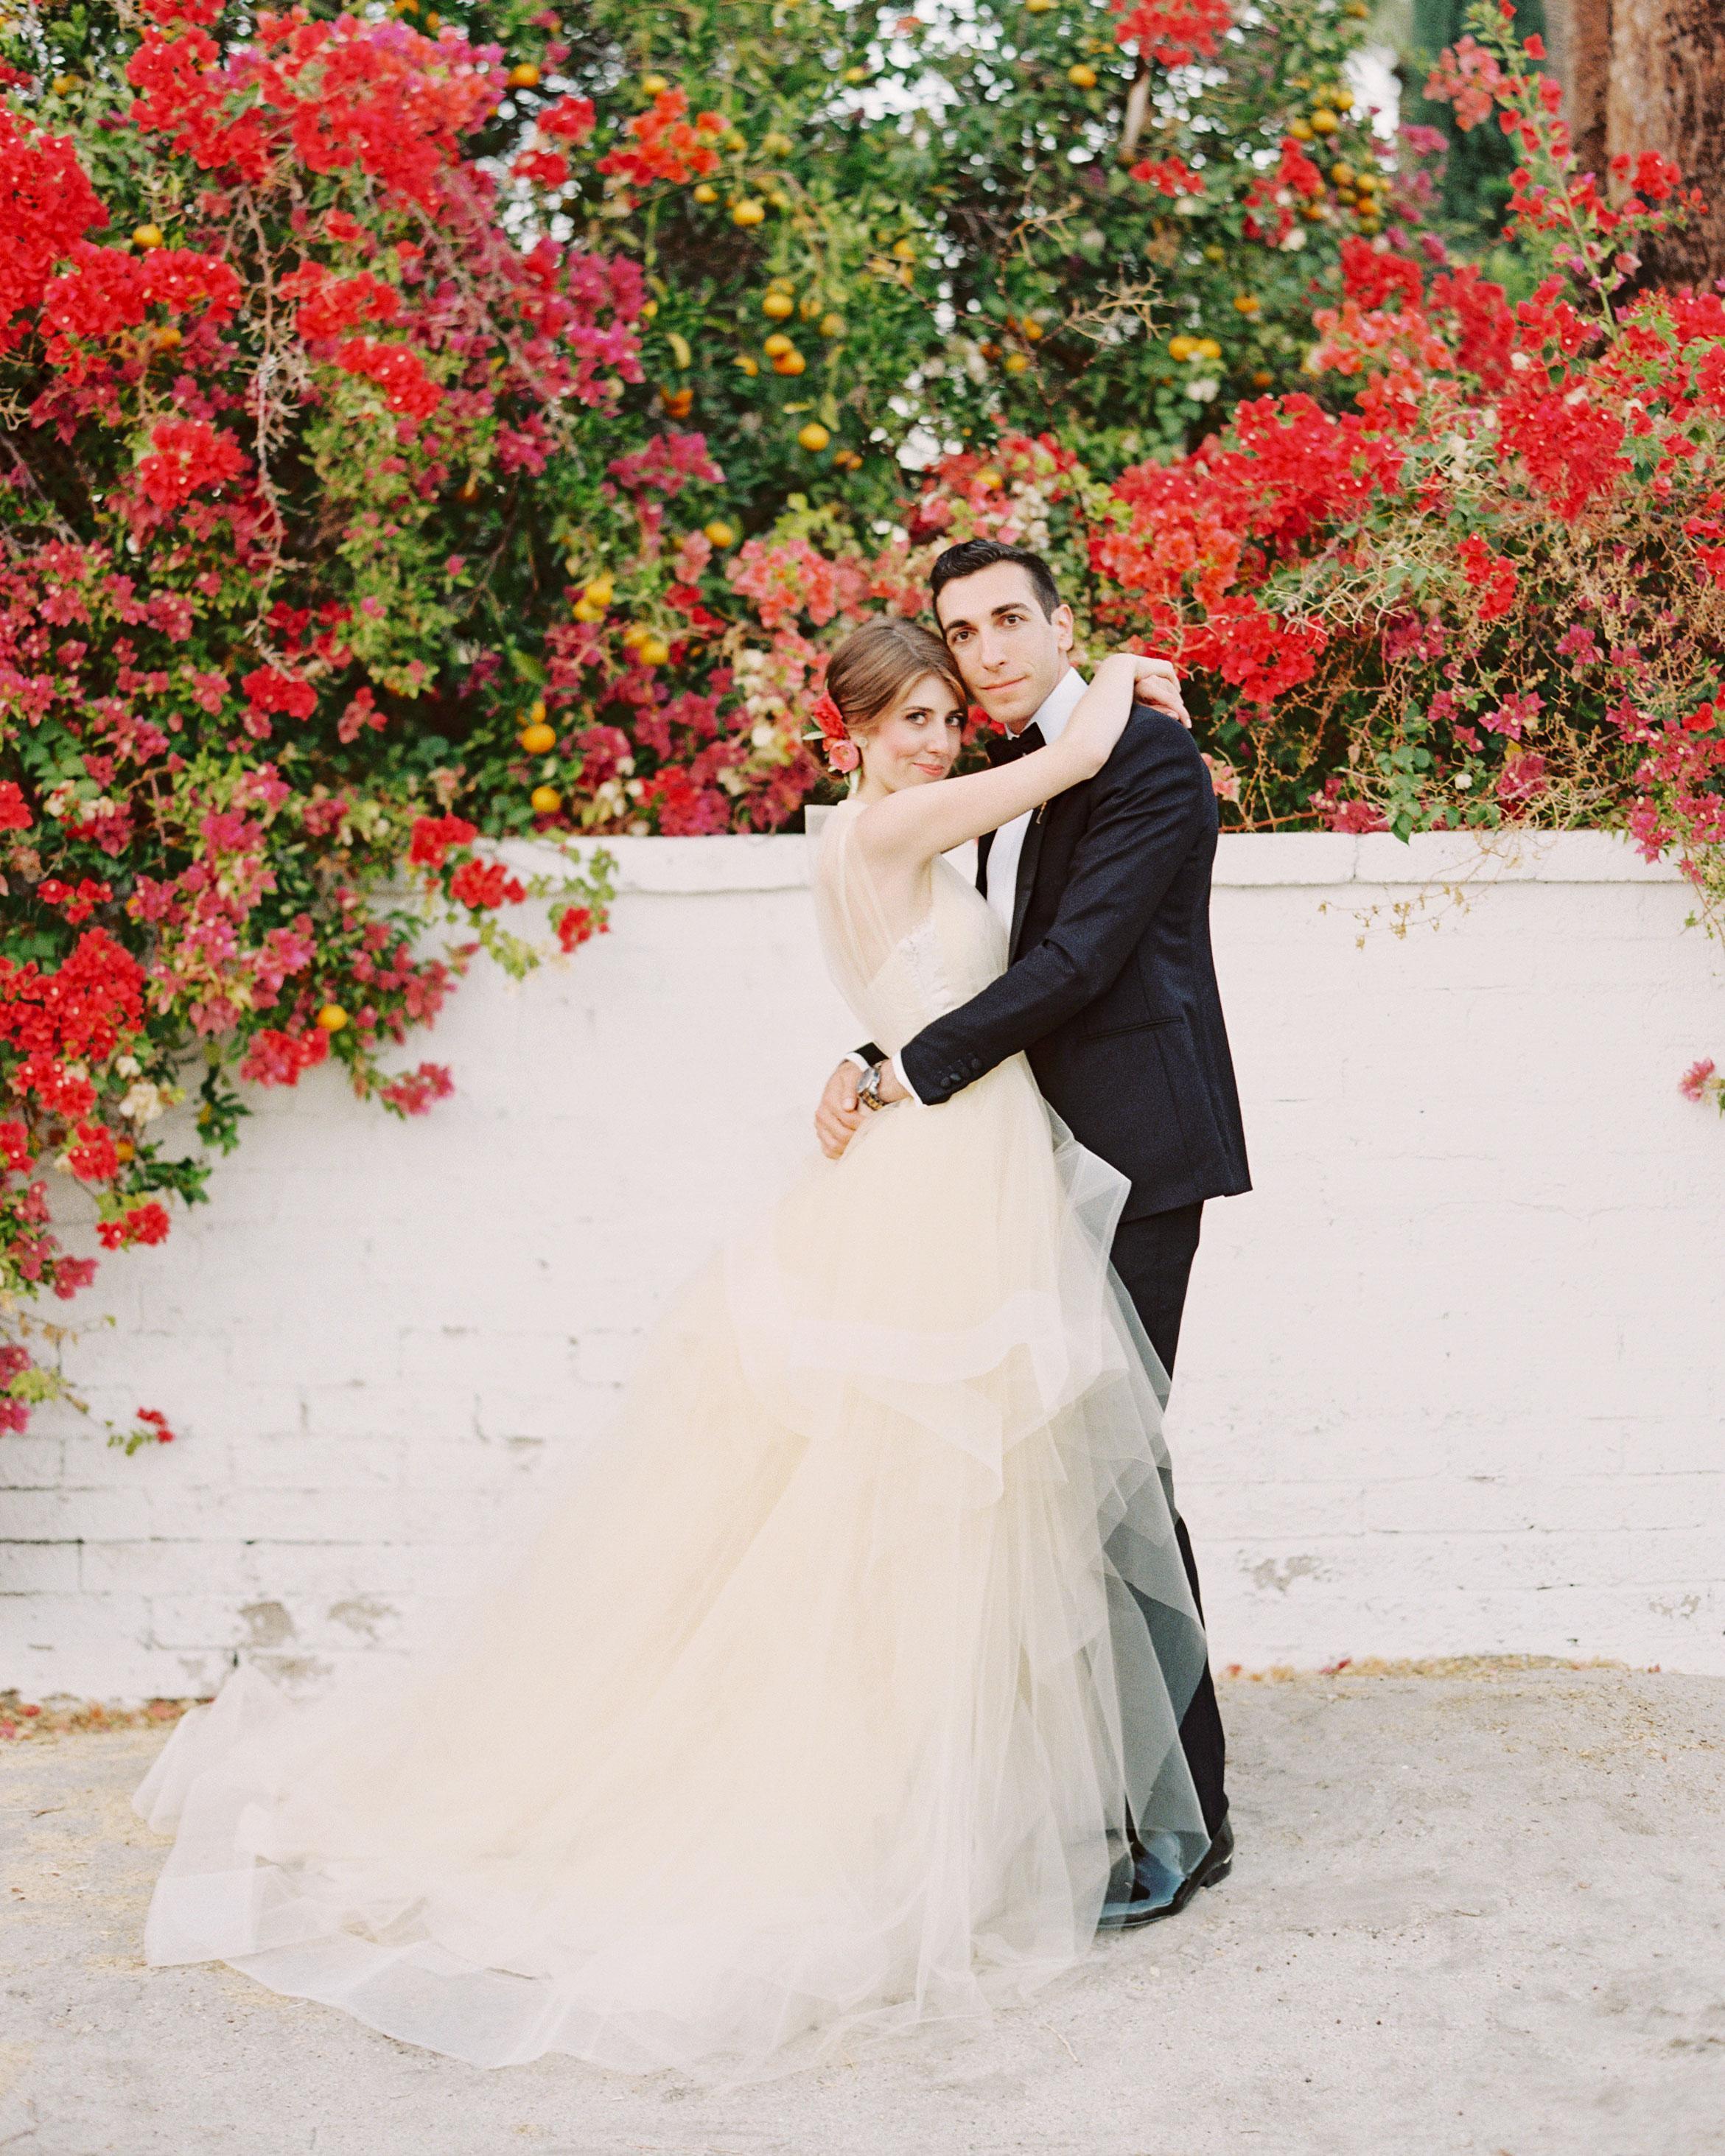 kelly-jeff-wedding-palm-springs-couple-portrait-0929-s112234.jpg